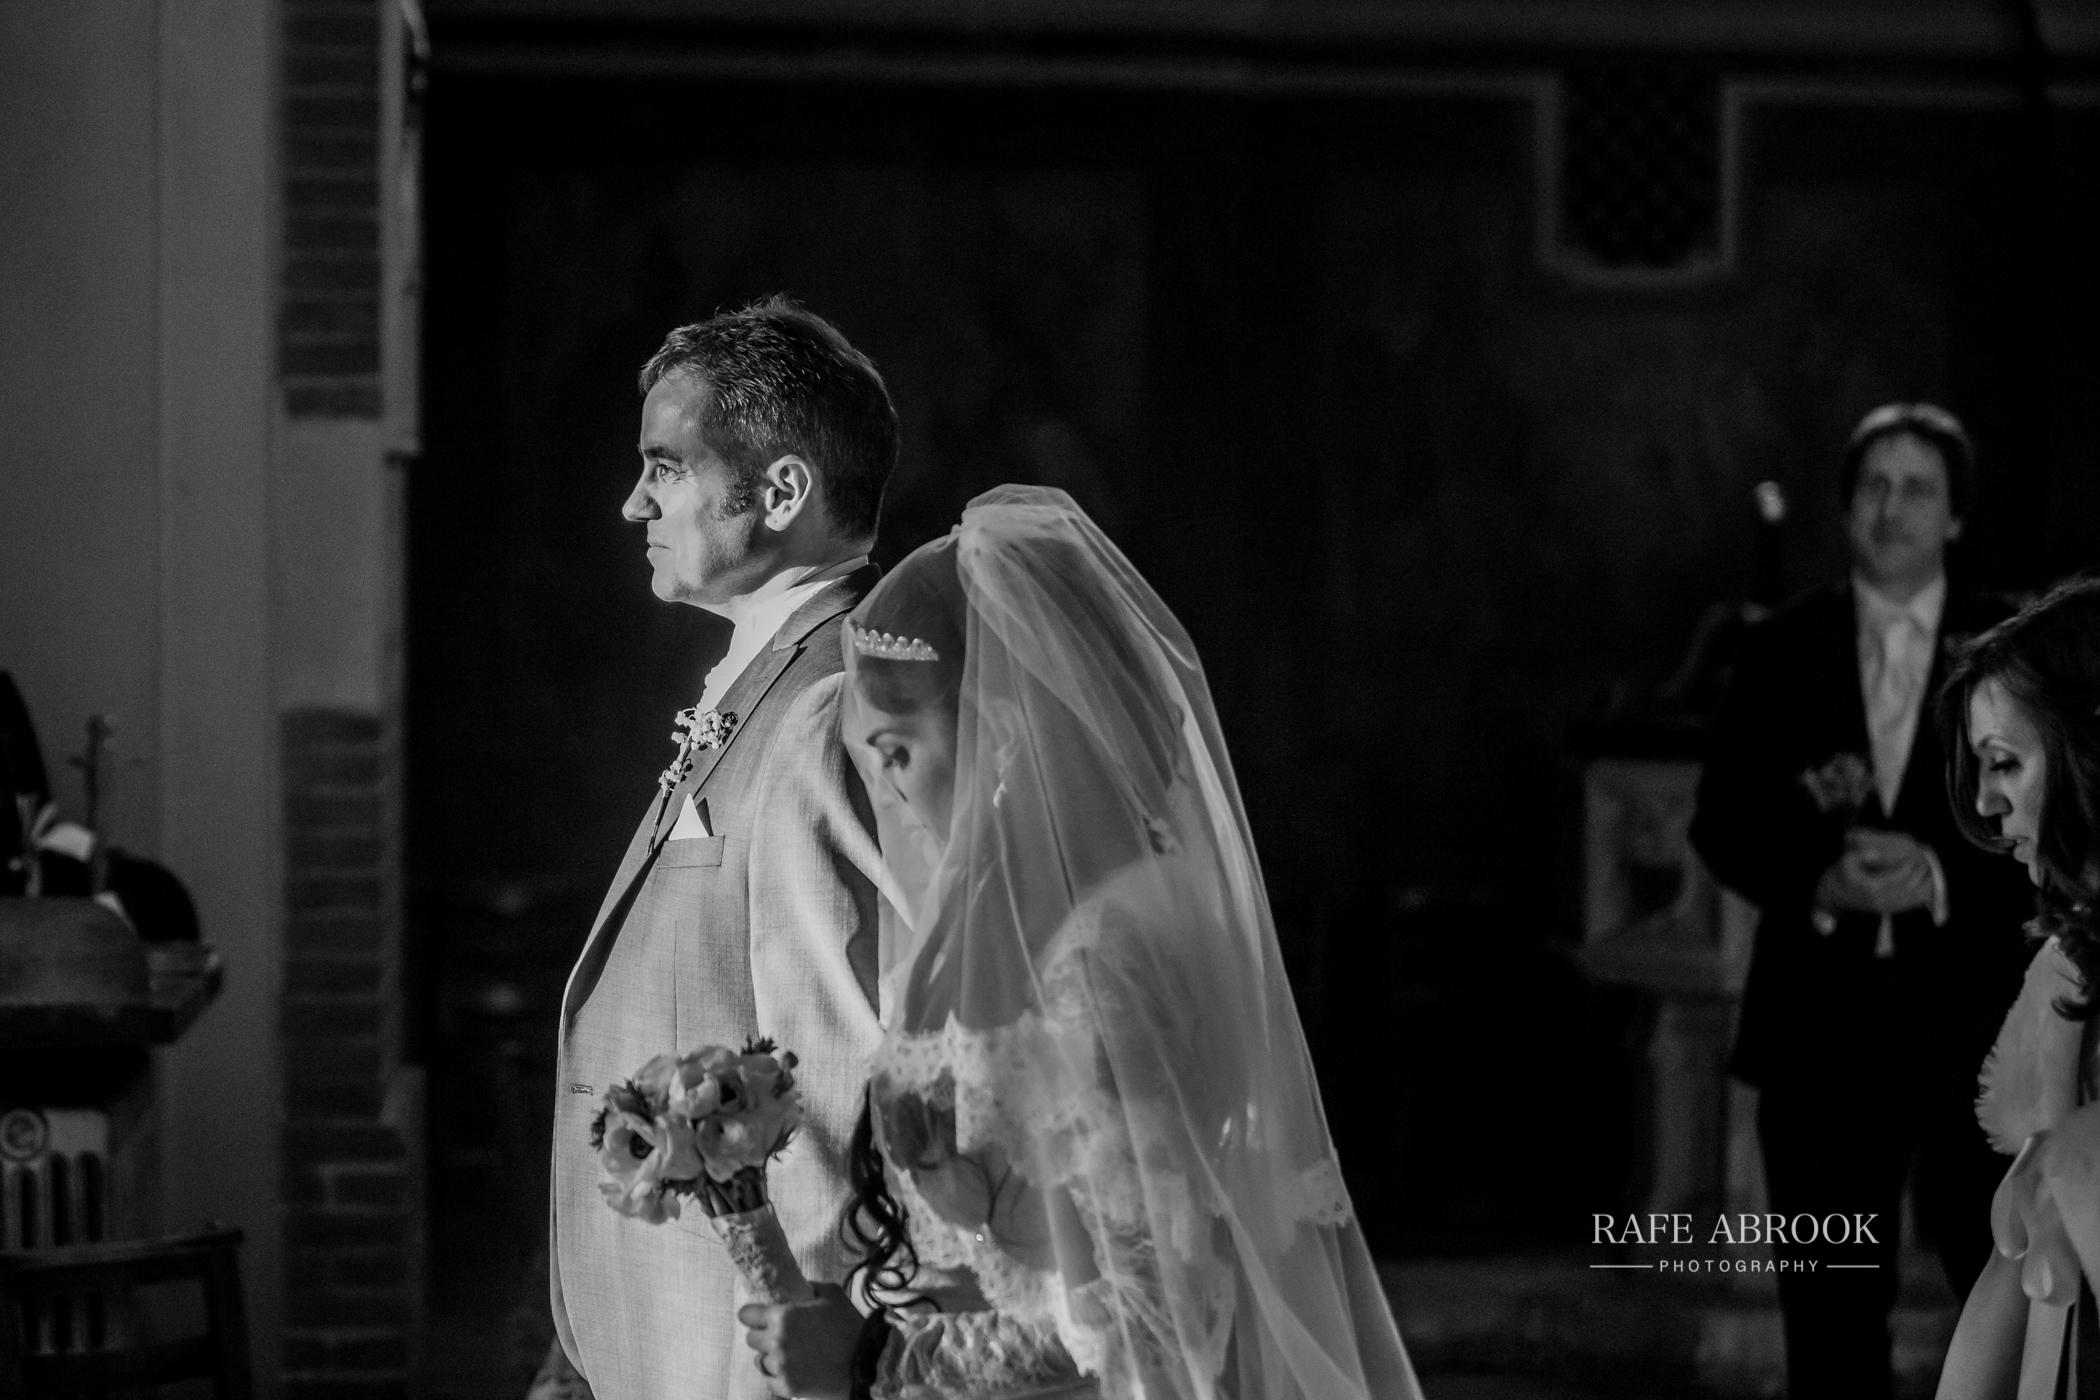 roma & pete wedding hampstead shenley hertfordshire -244.jpg